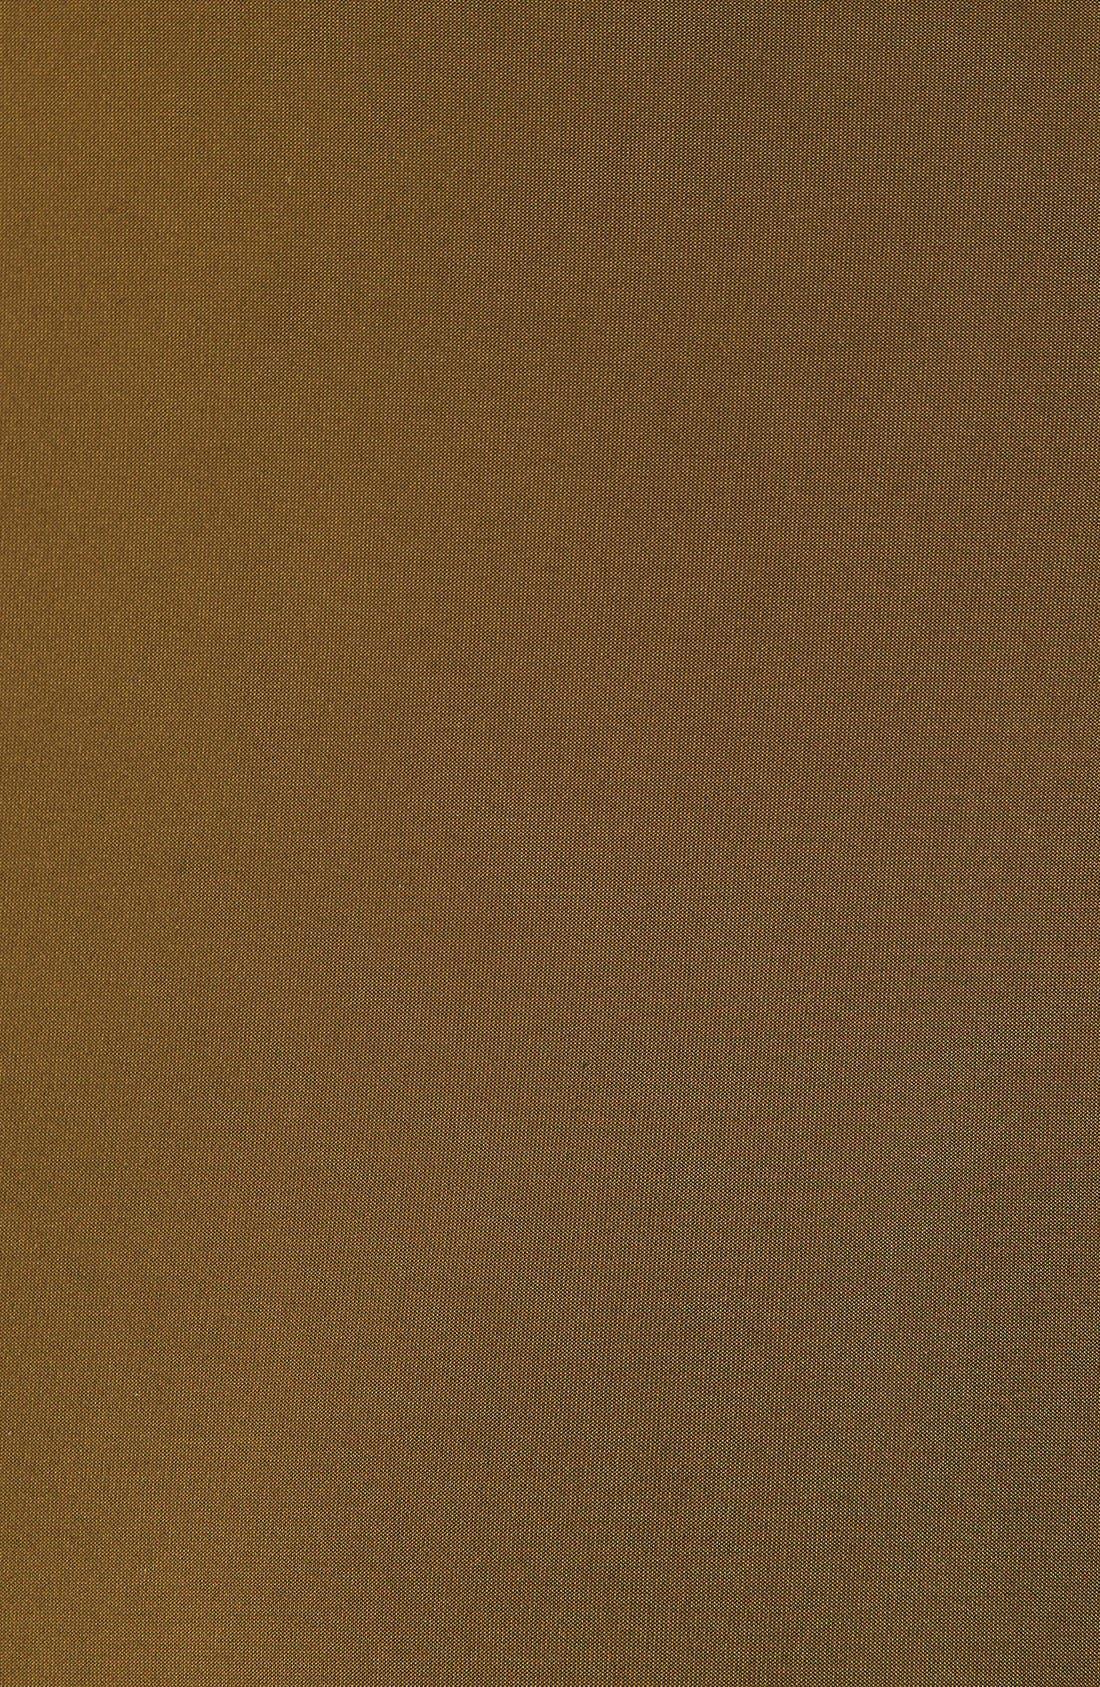 Strappy Back Maxi Dress,                             Alternate thumbnail 3, color,                             291